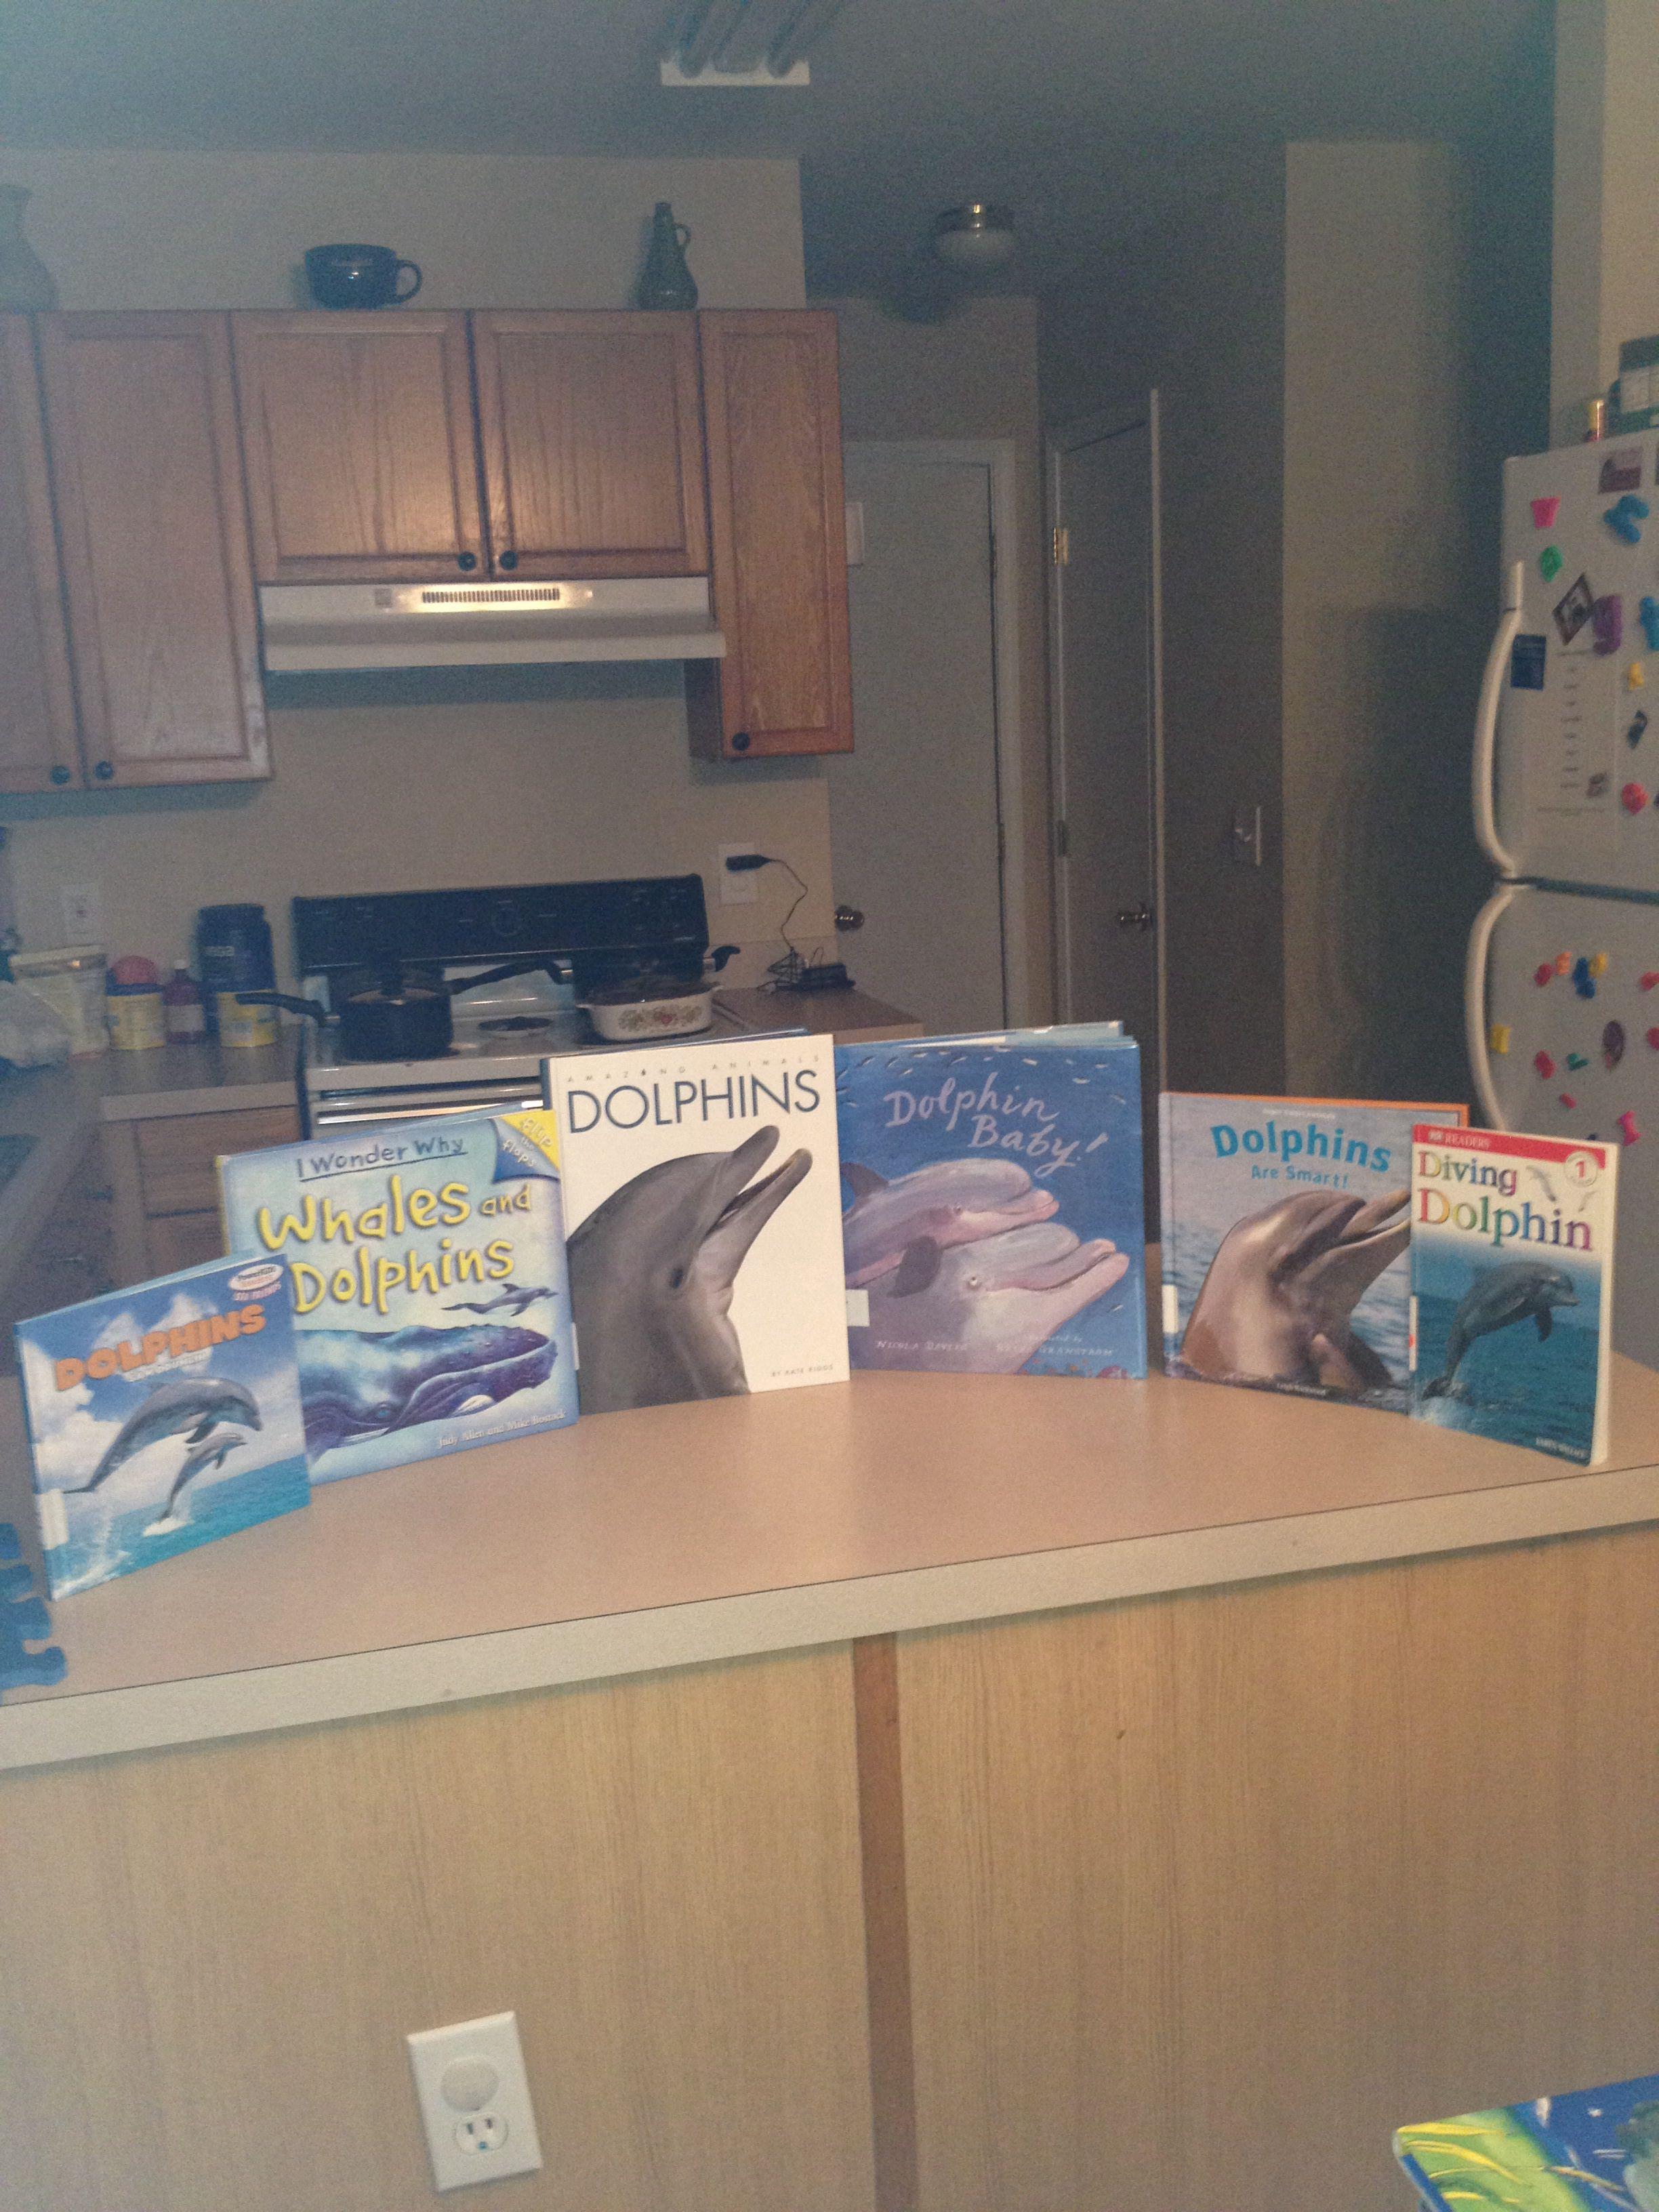 Dolphin Books